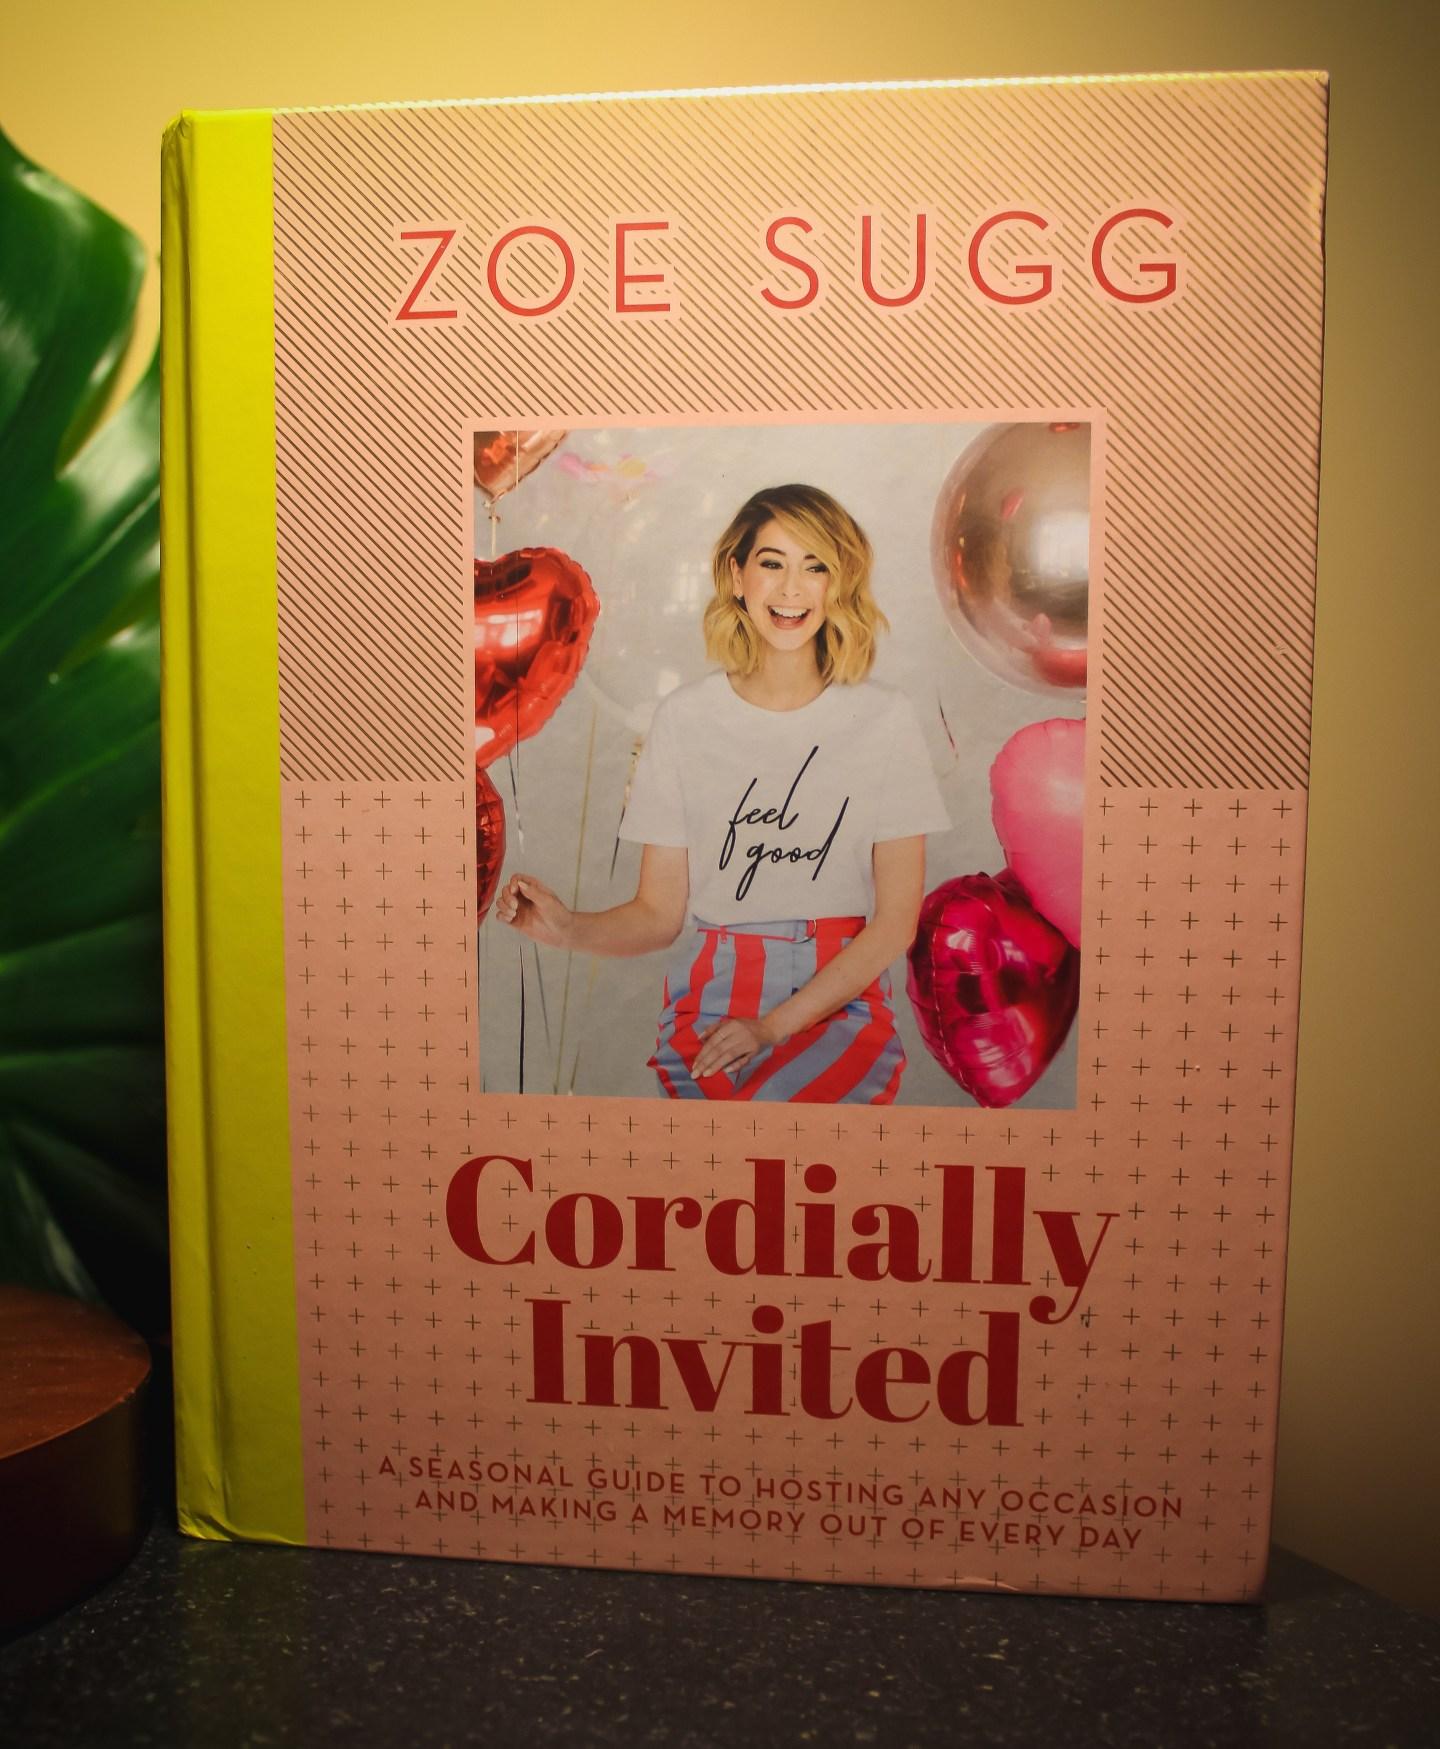 Zoe-Sugg-Cordially-Invited-1.jpg